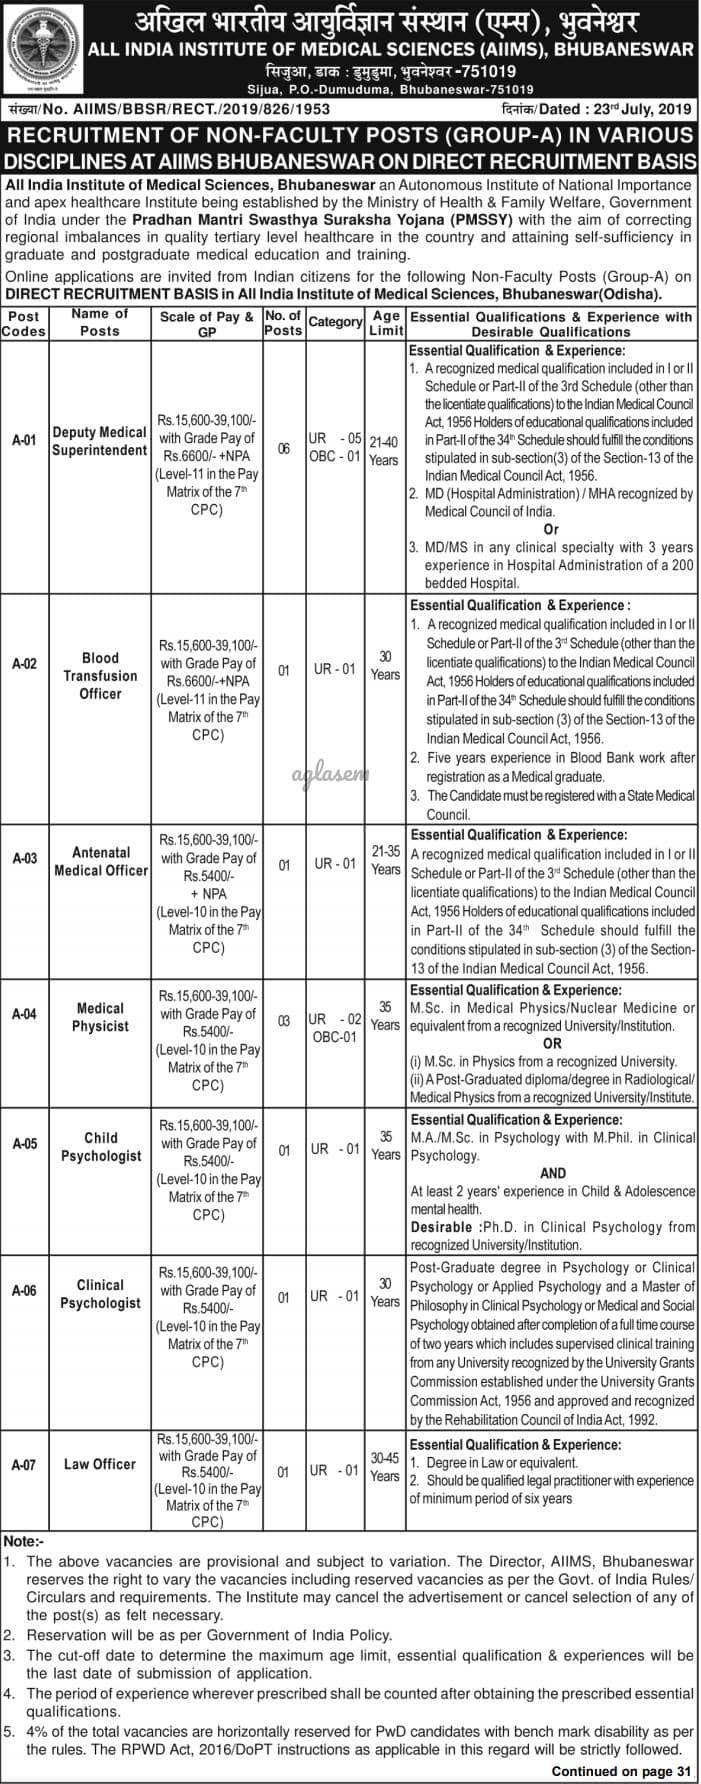 AIIMS Bhubaneswar Recruitment 2019: 14 vacancies for non faculty Group-A posts